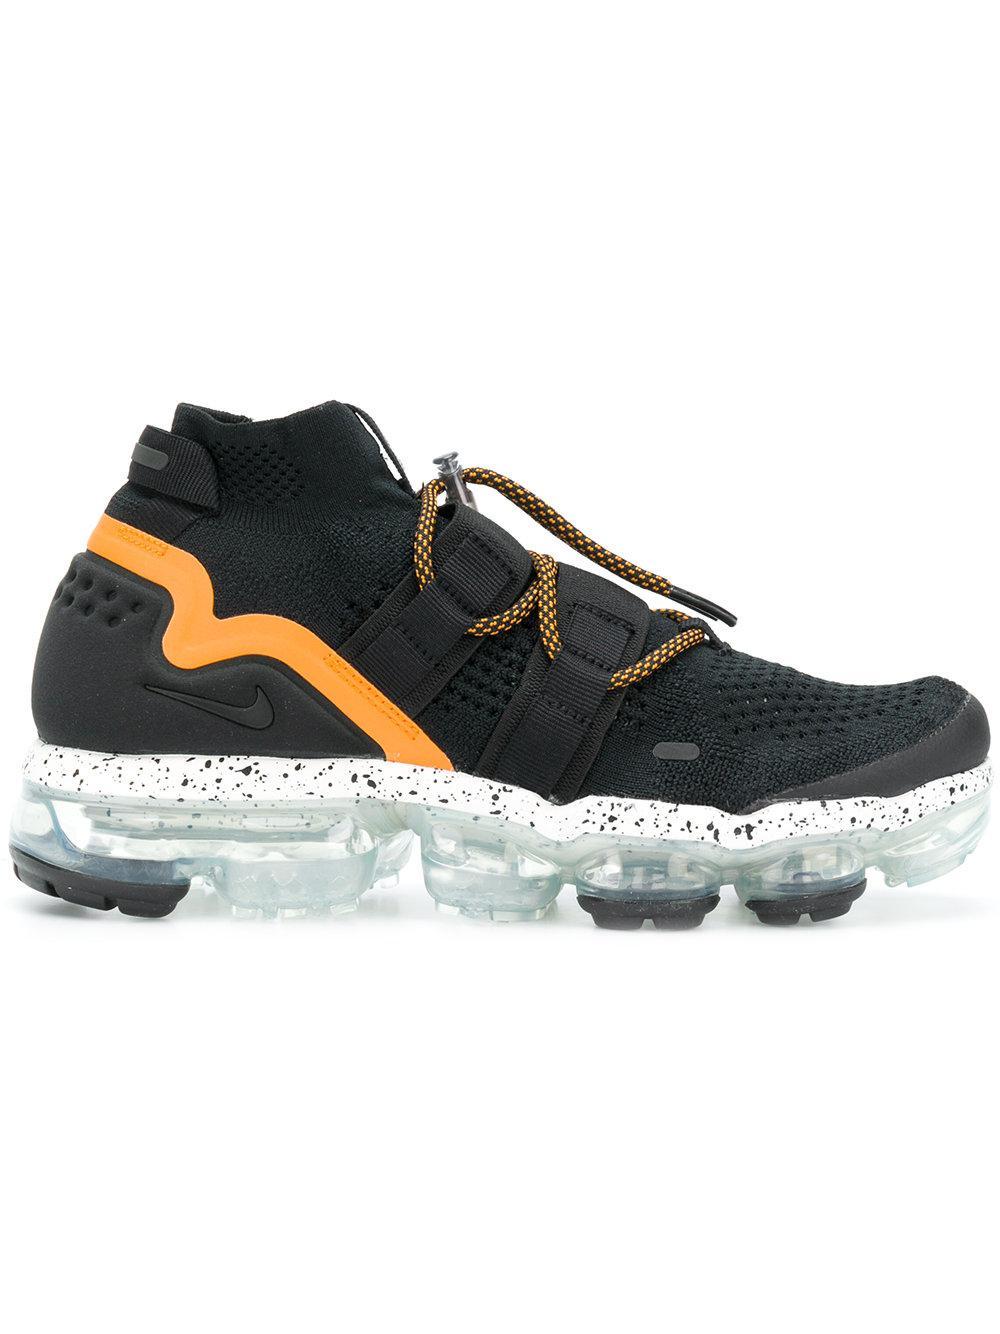 7de9f1d4bb9 Nike Air Vapormax Flyknit Utility Sneakers